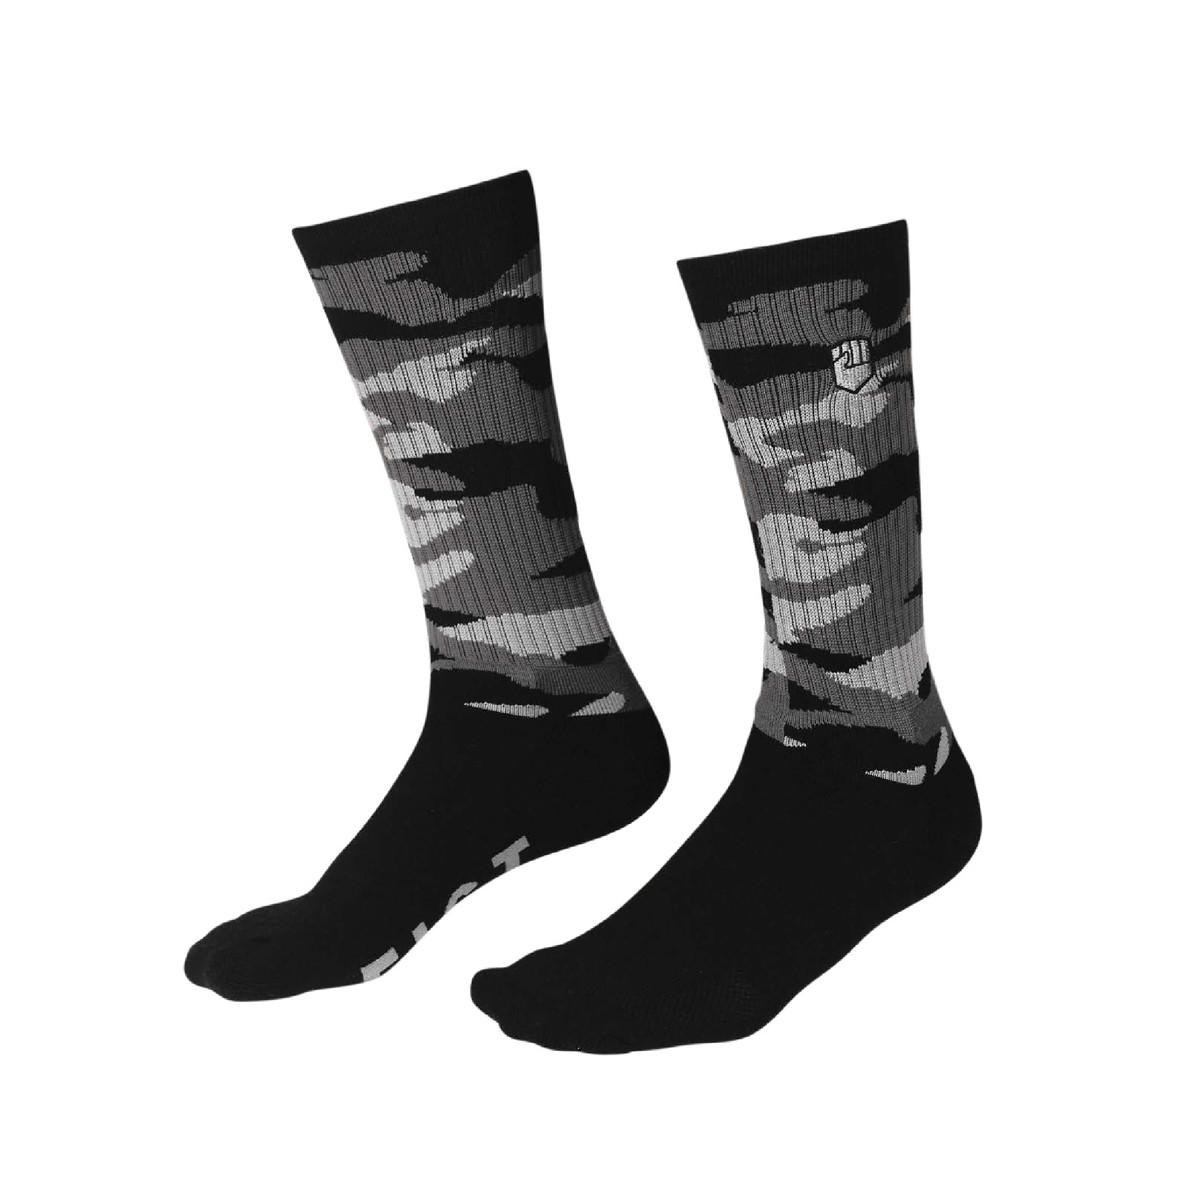 Fist Handwear Camo Crew Socks